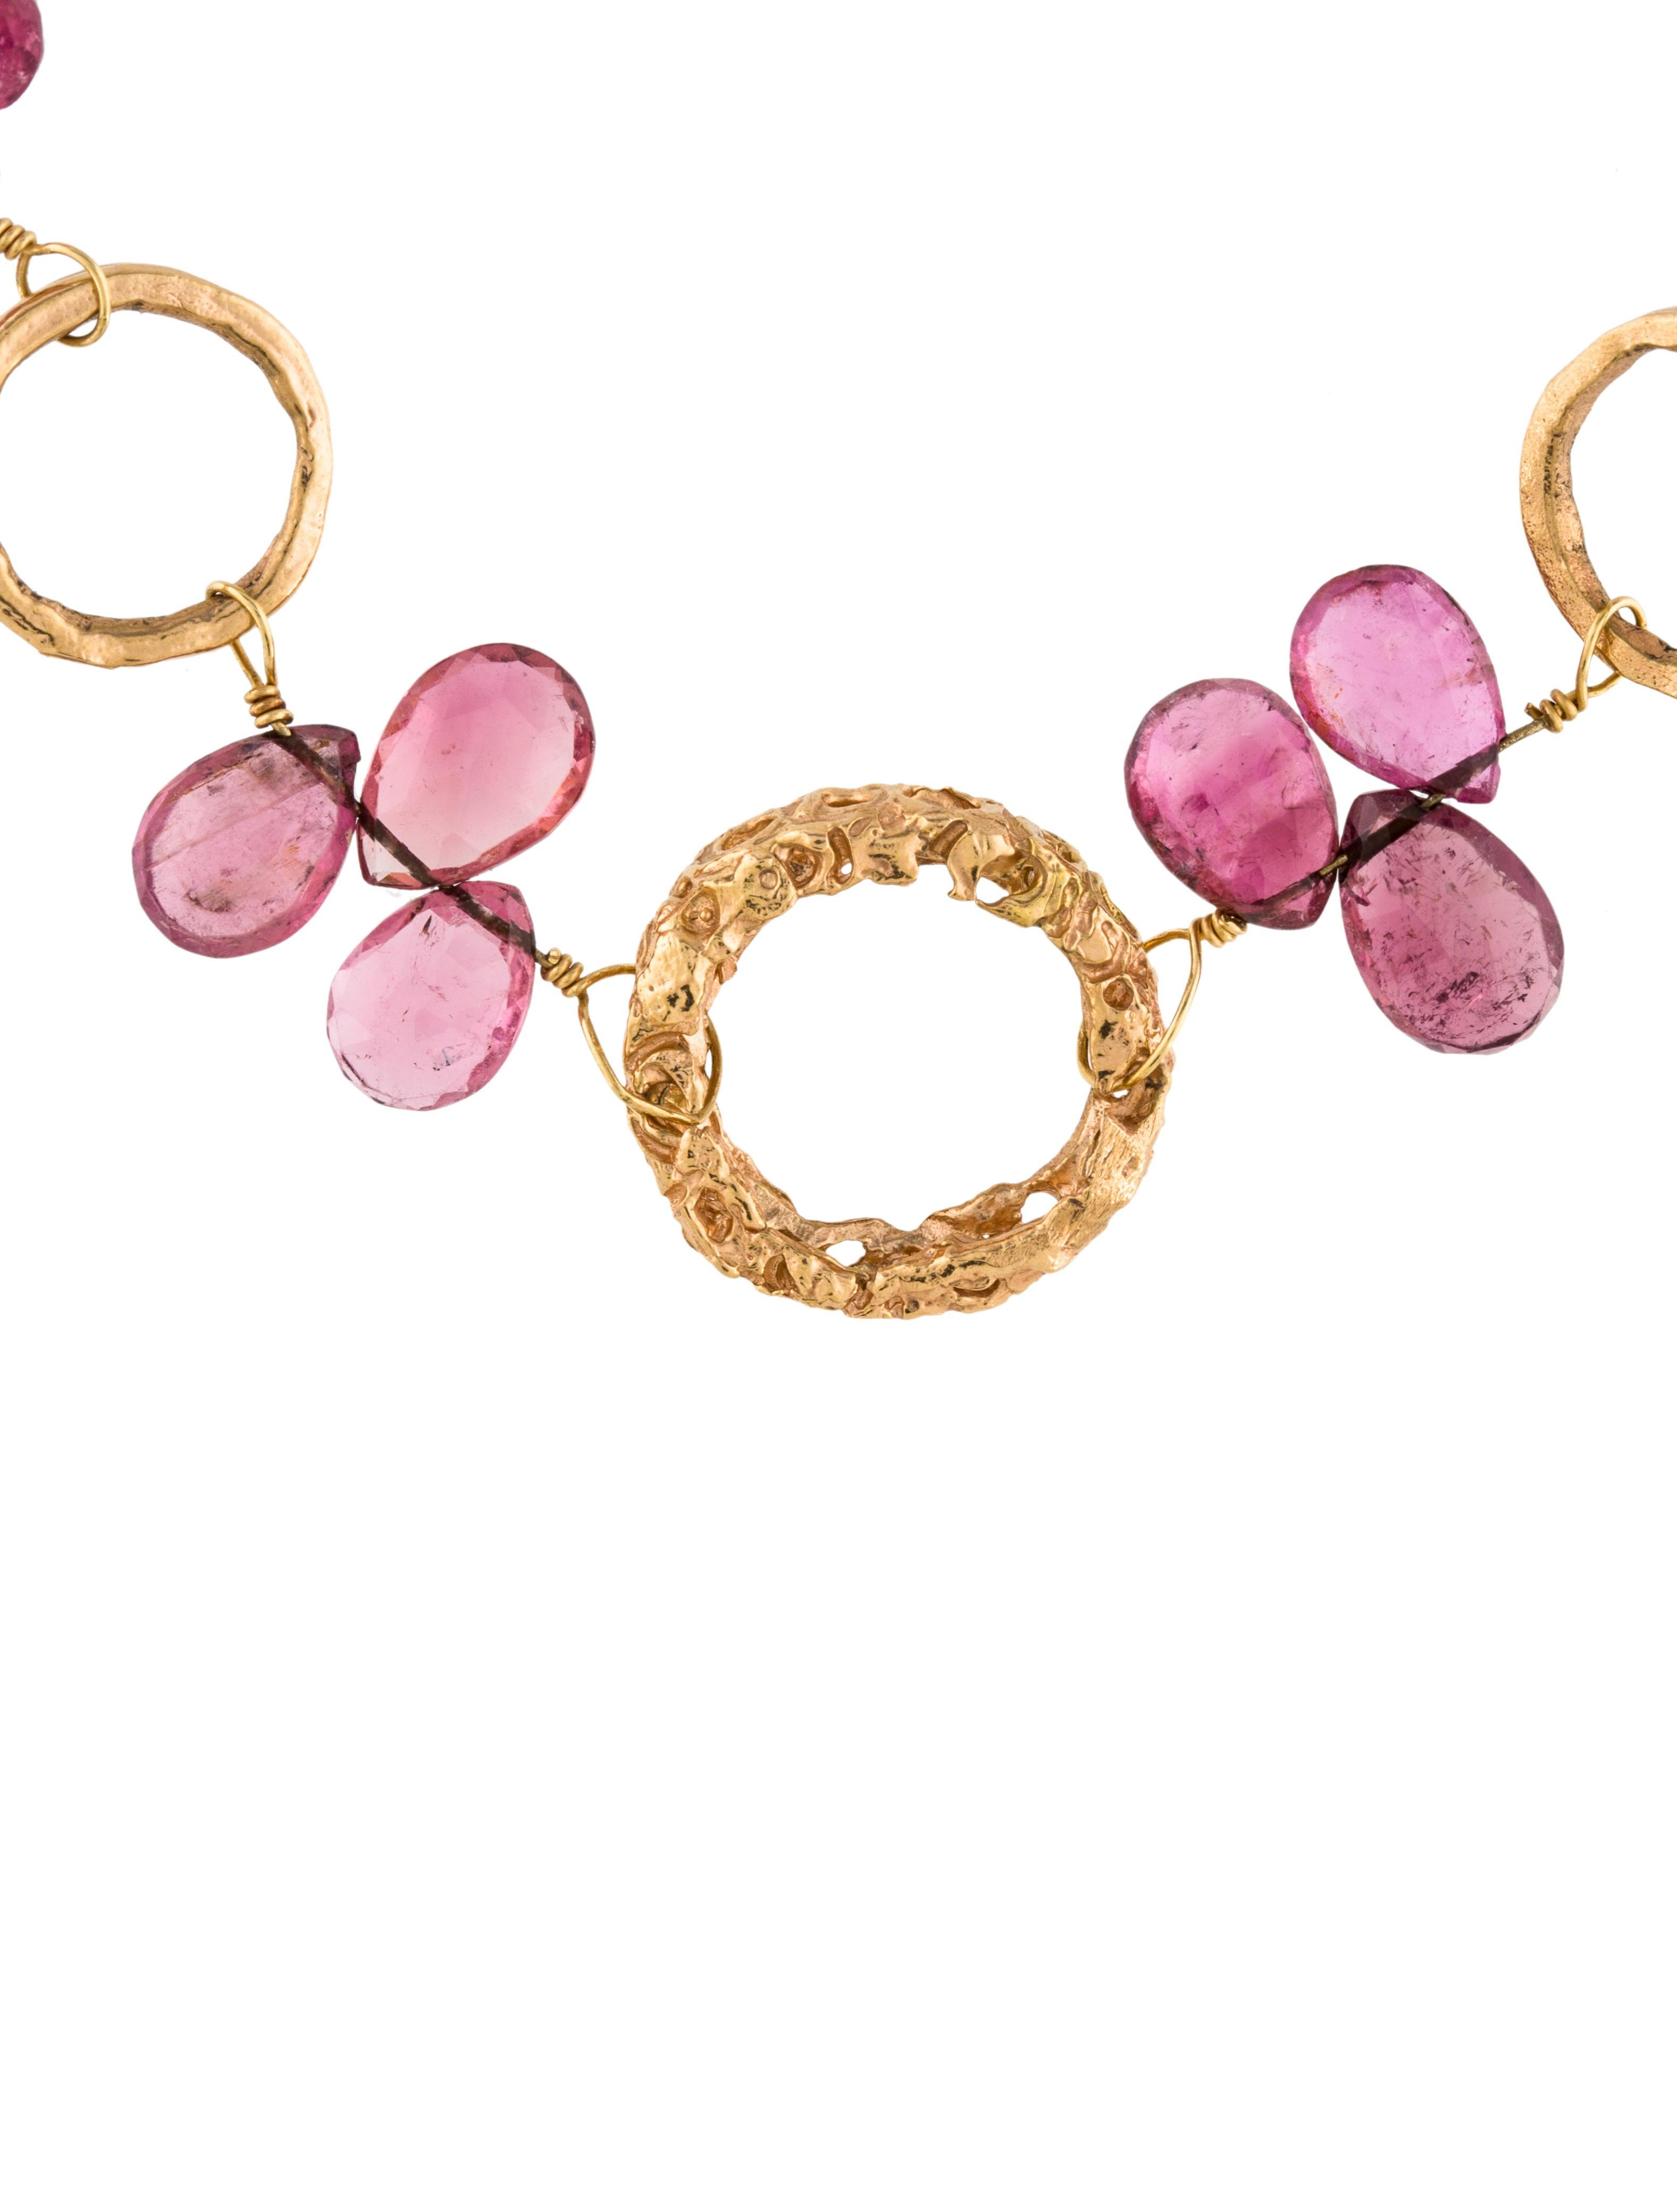 dominique cohen 18k pink tourmaline chain necklace. Black Bedroom Furniture Sets. Home Design Ideas